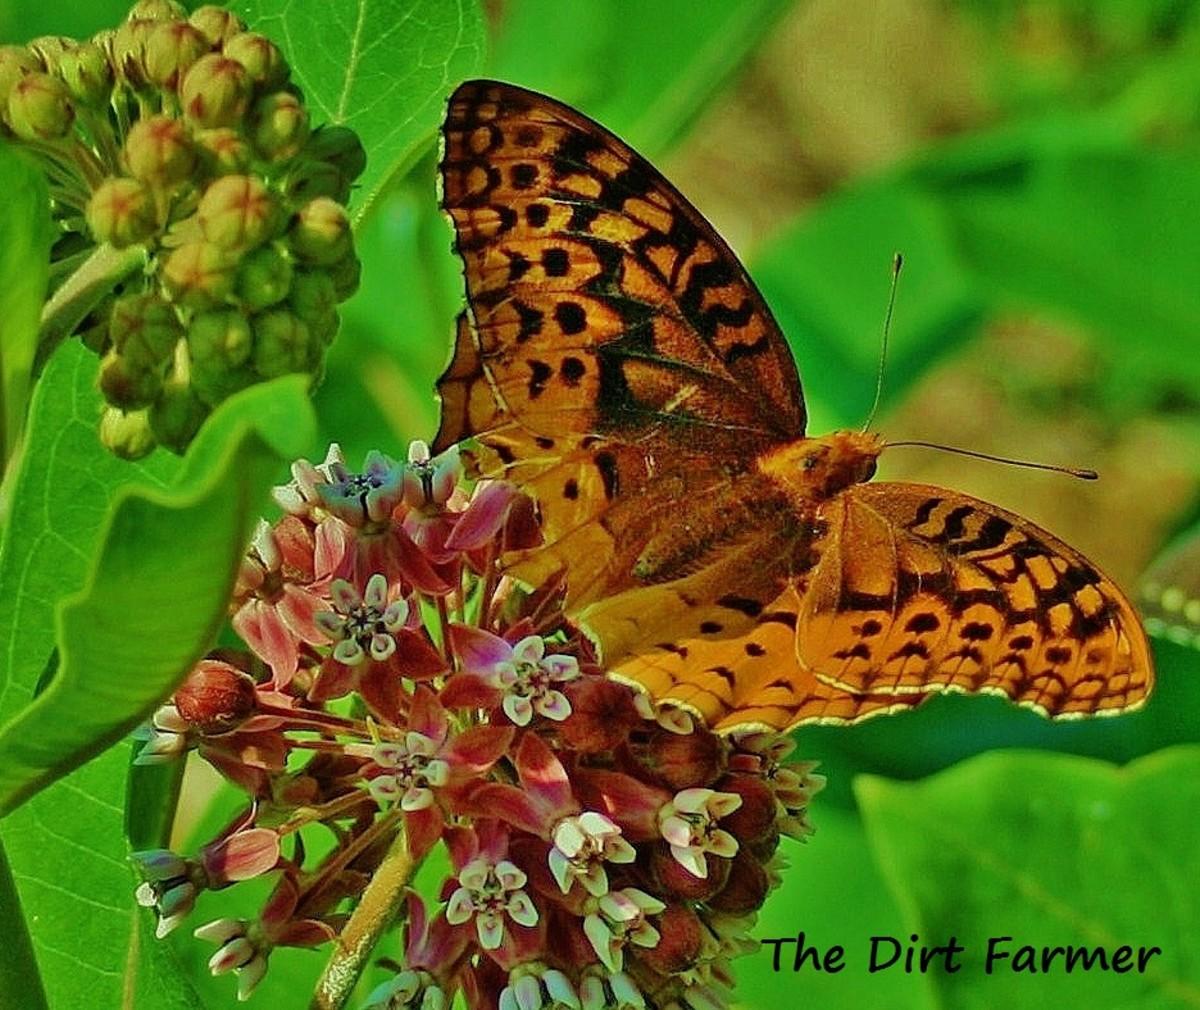 Like Asclepias tuberosa, swamp milkweed (Aesclepias incarnata) is a favorite of butterflies.